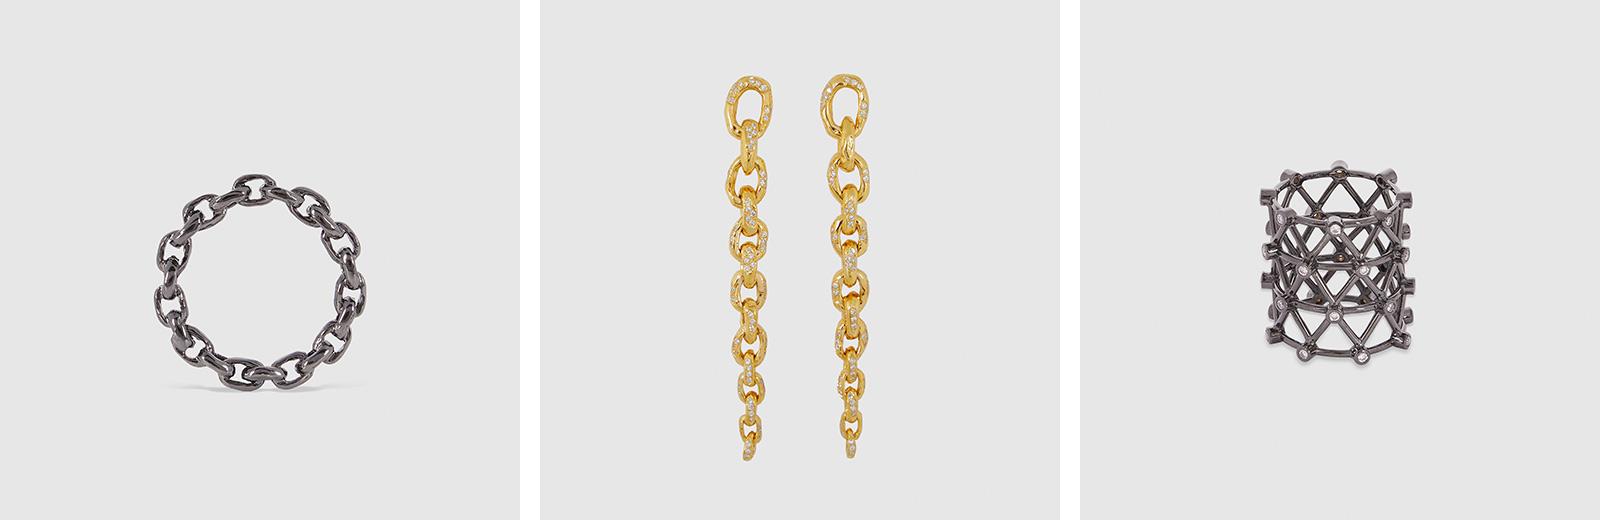 dsmg_jewellery_patcharavipa.jpg